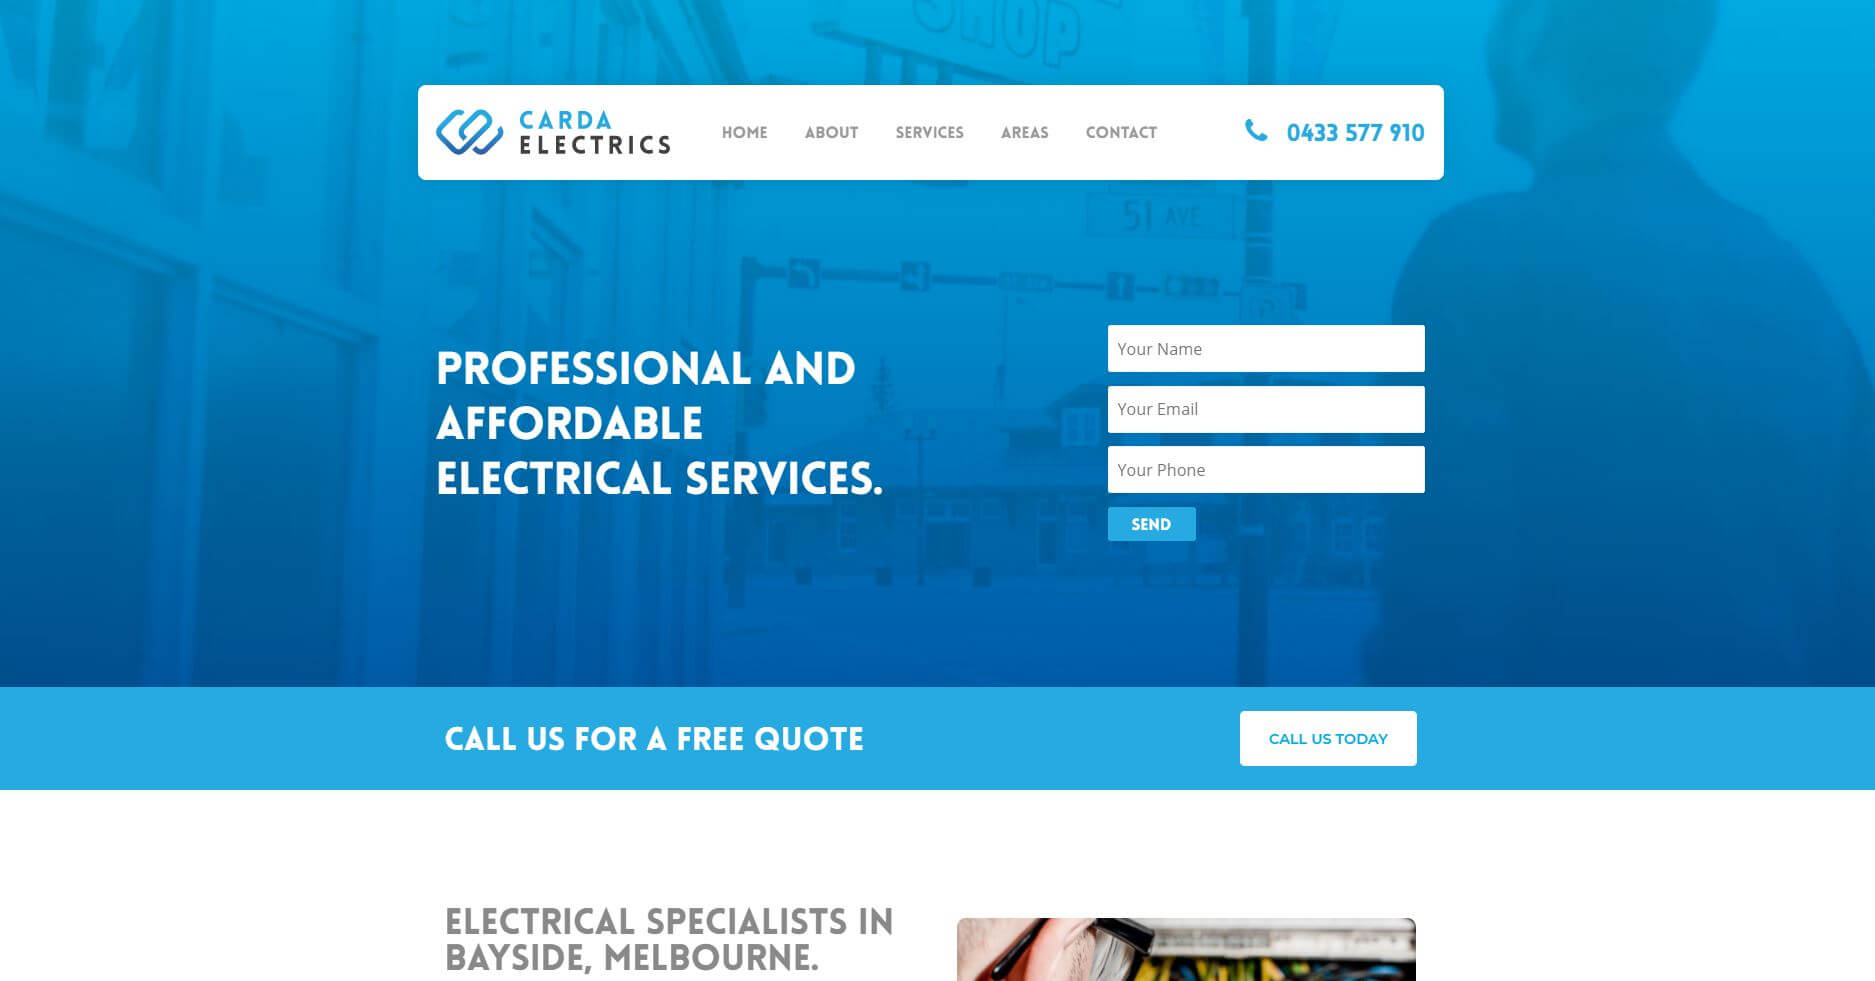 Carda Electrics